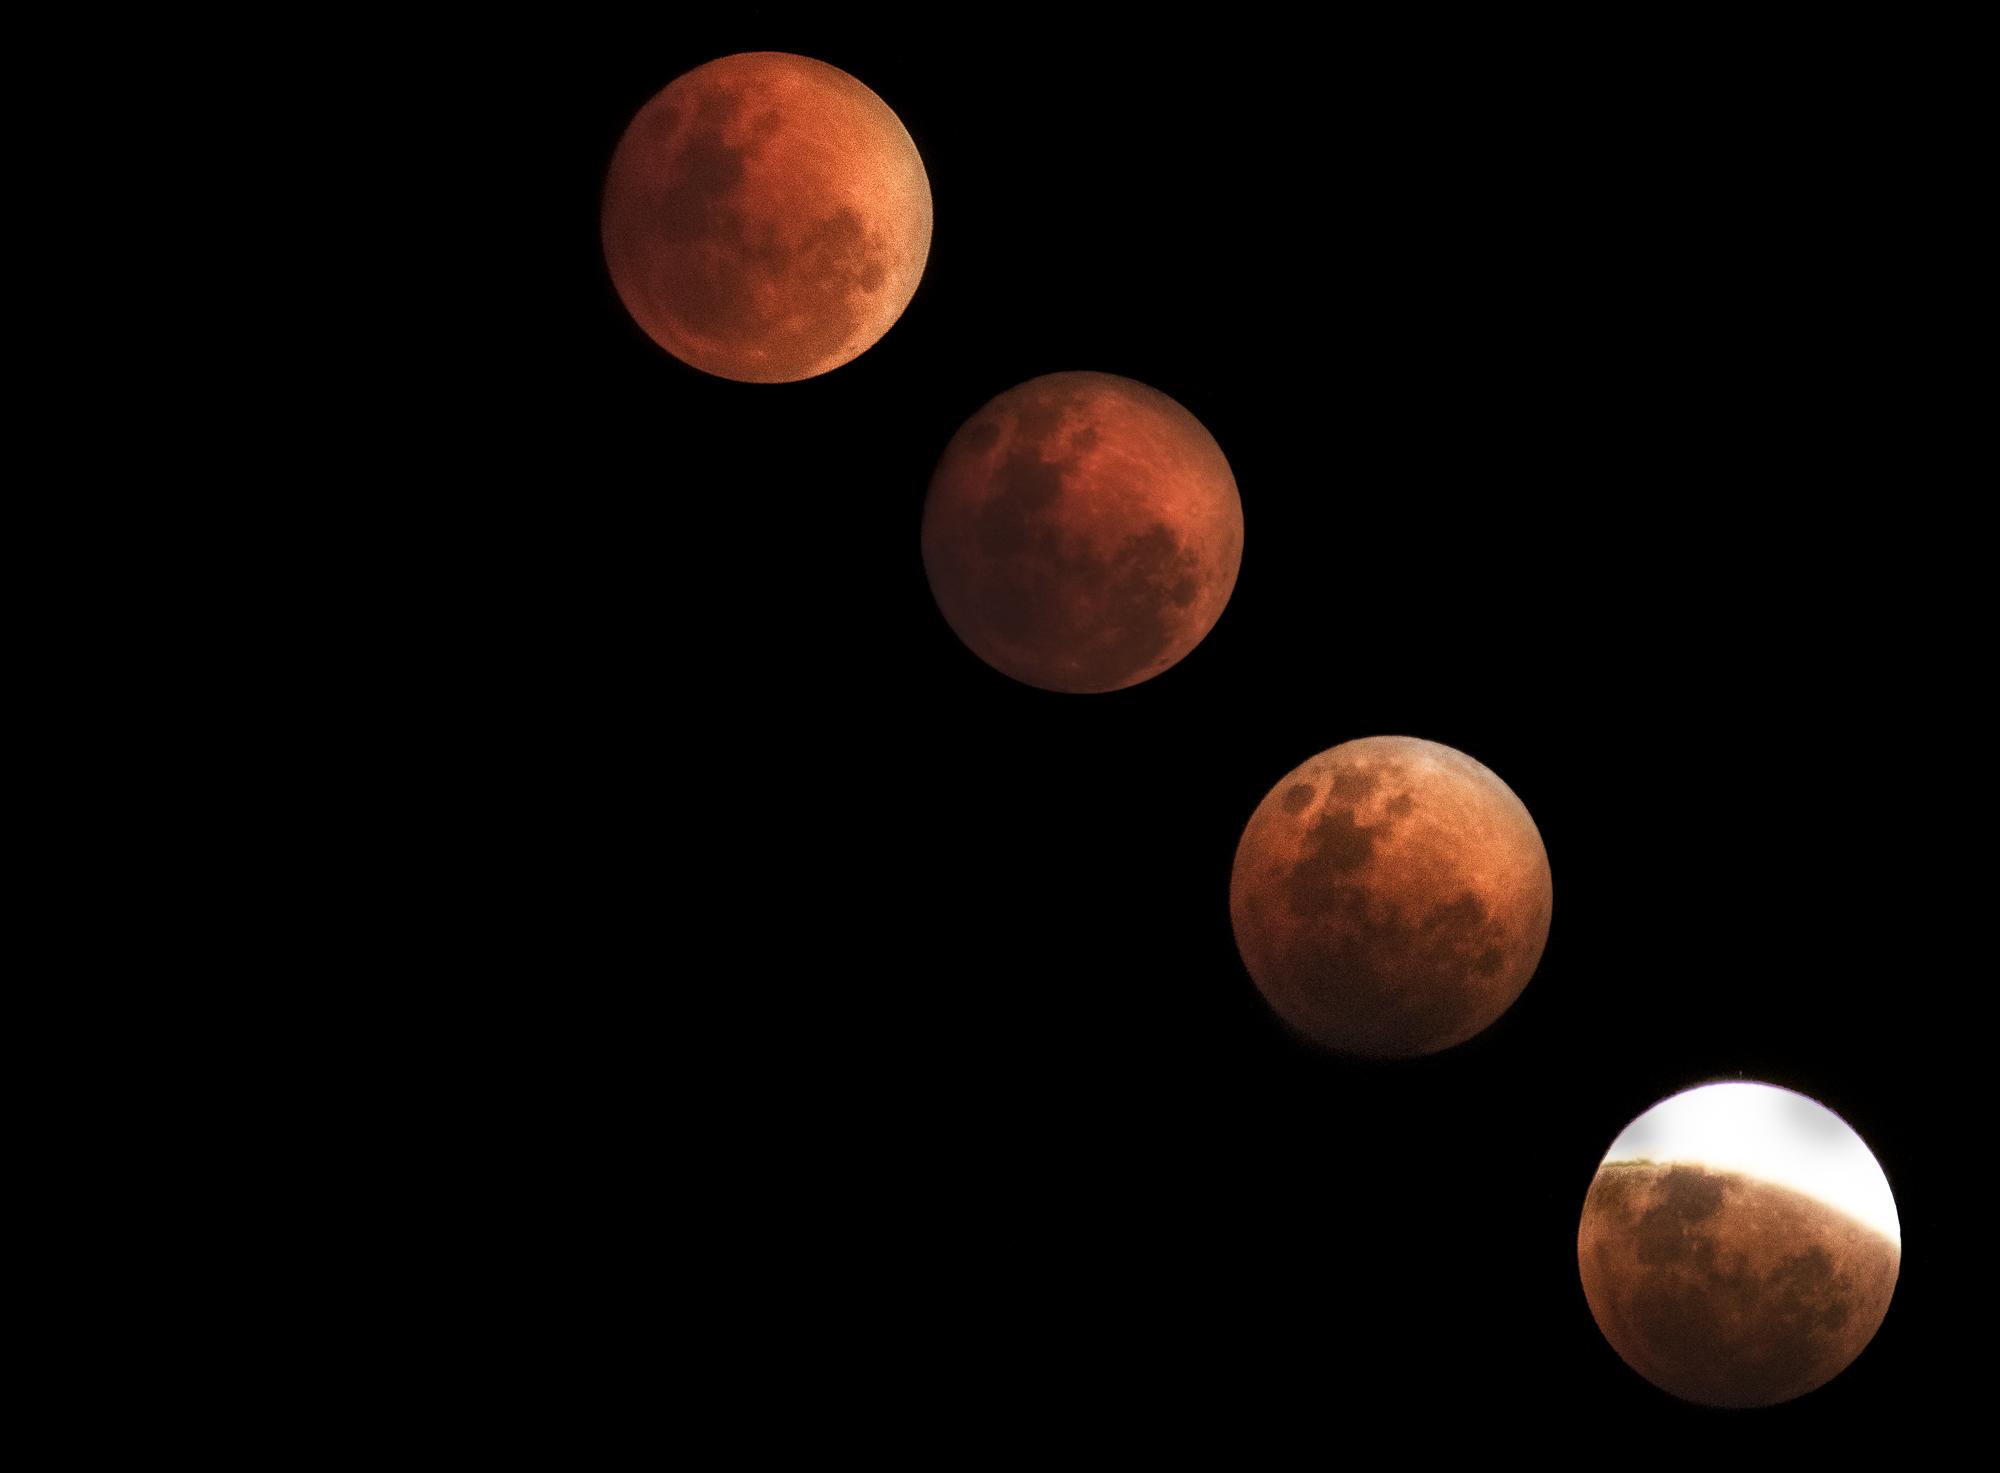 Timelapse_Eclipse-9586.jpg